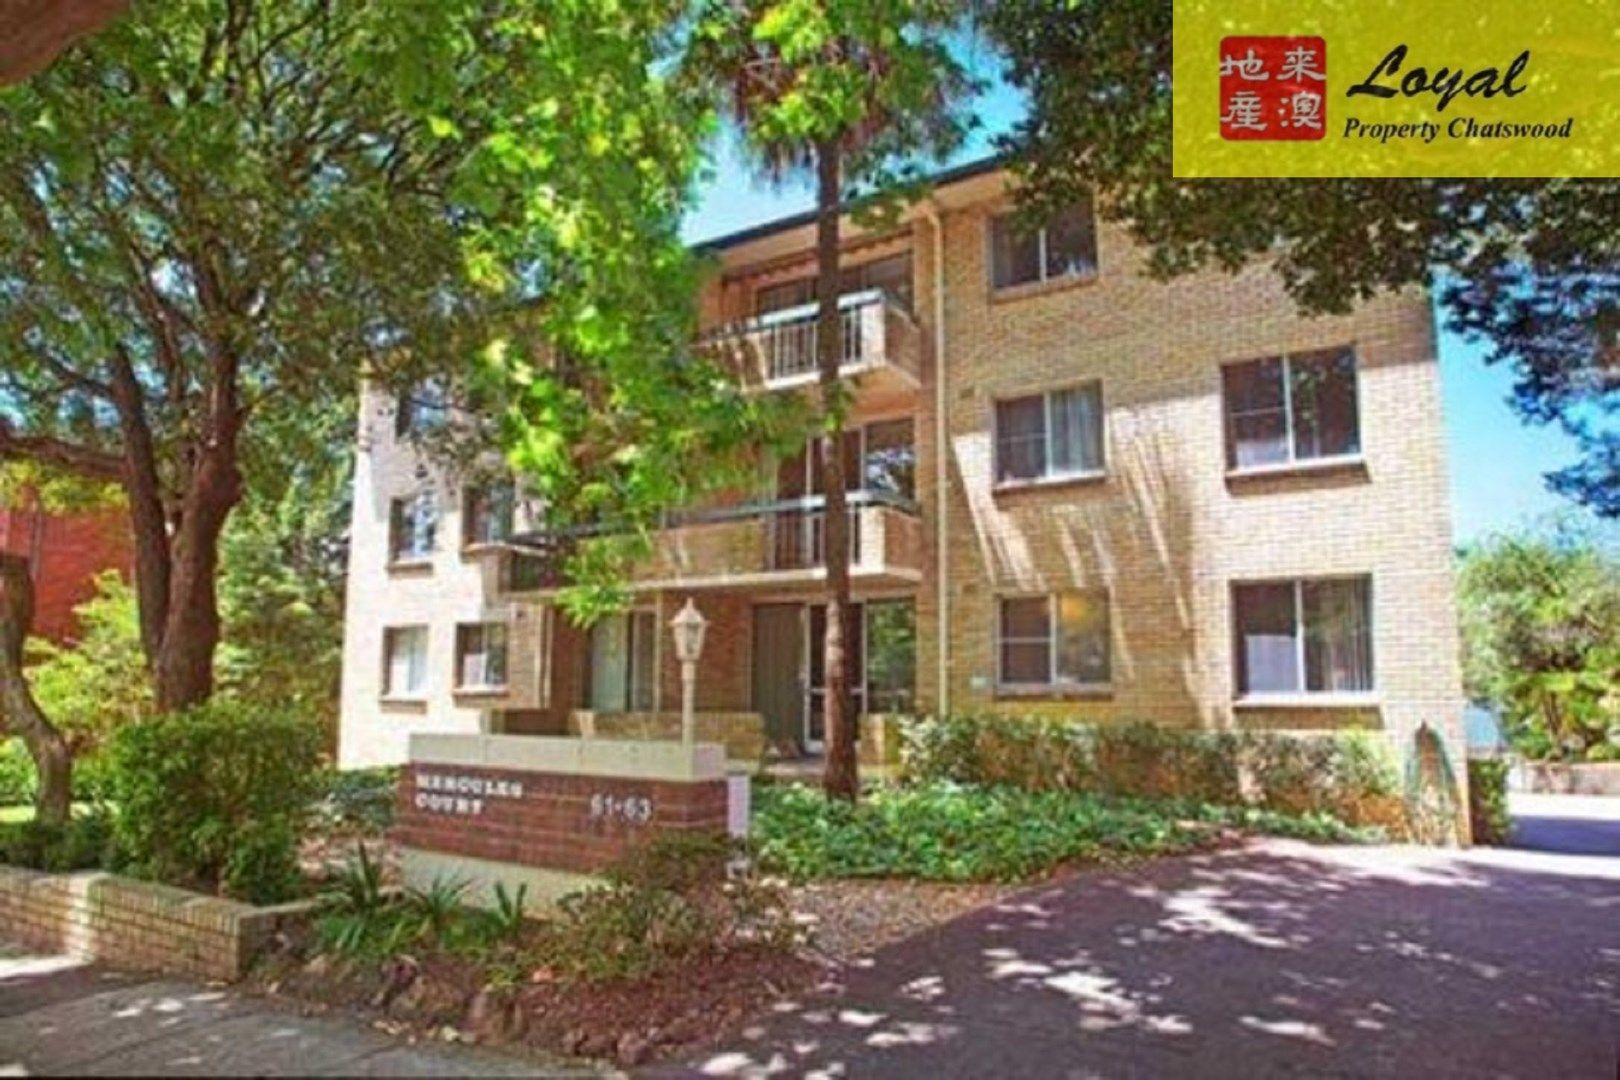 17/61-63 Hercules Street, Chatswood NSW 2067, Image 0